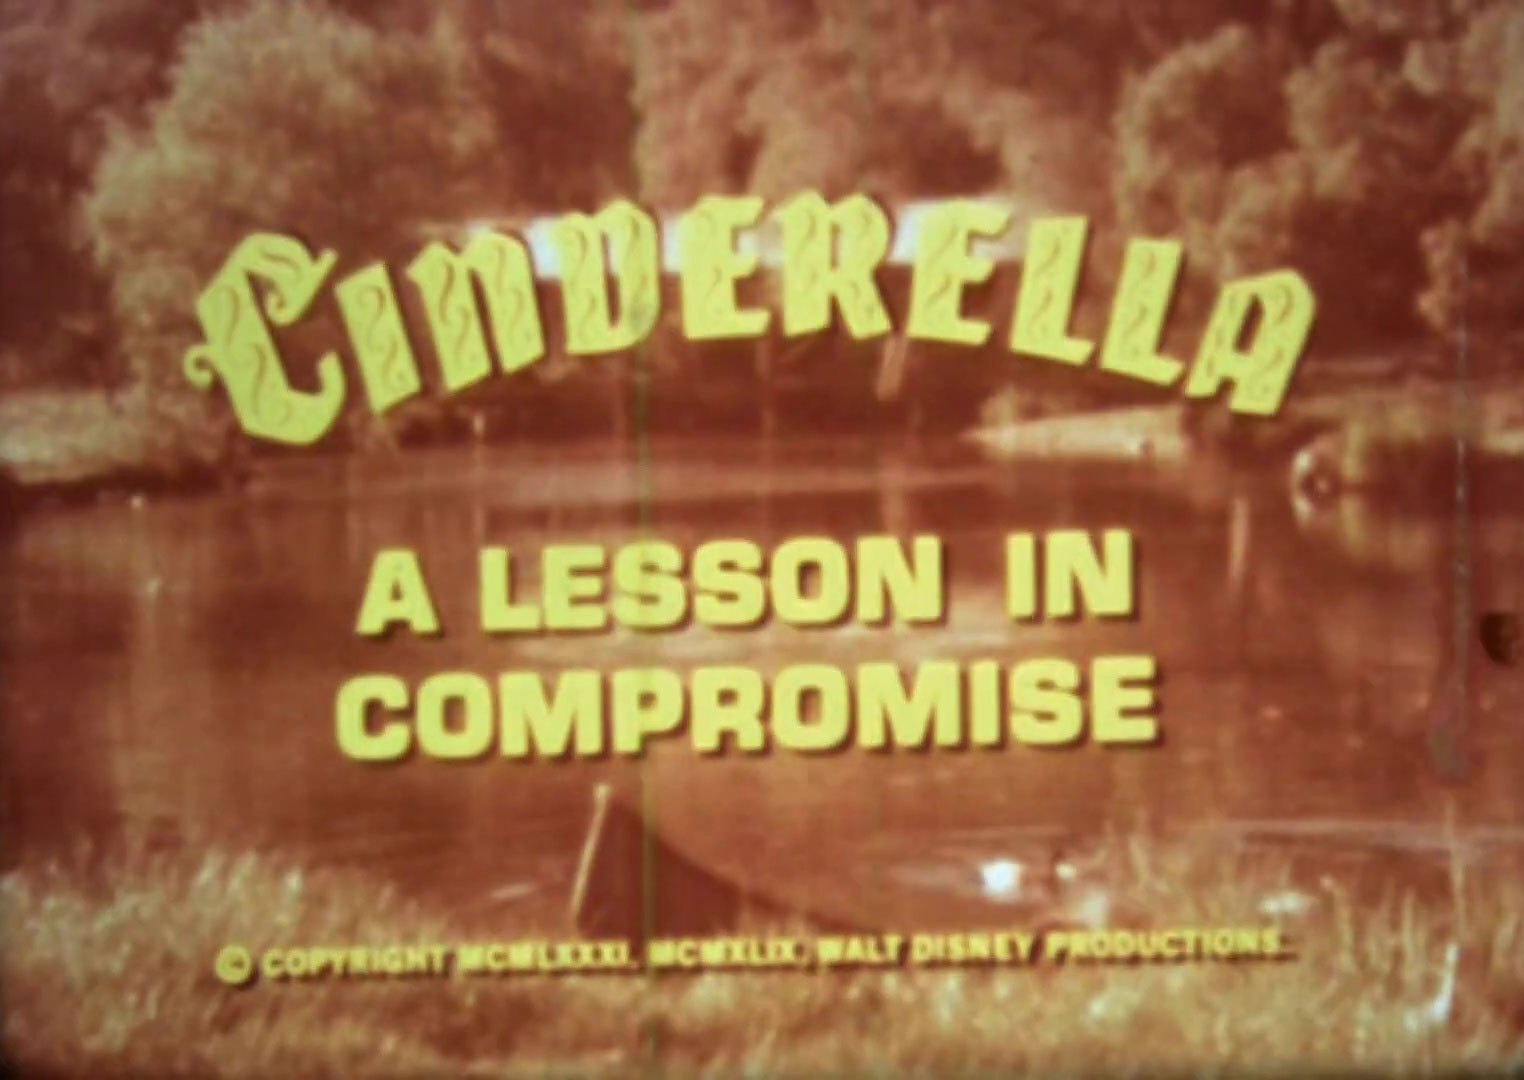 affiche poster cinderella lesson compromise disney